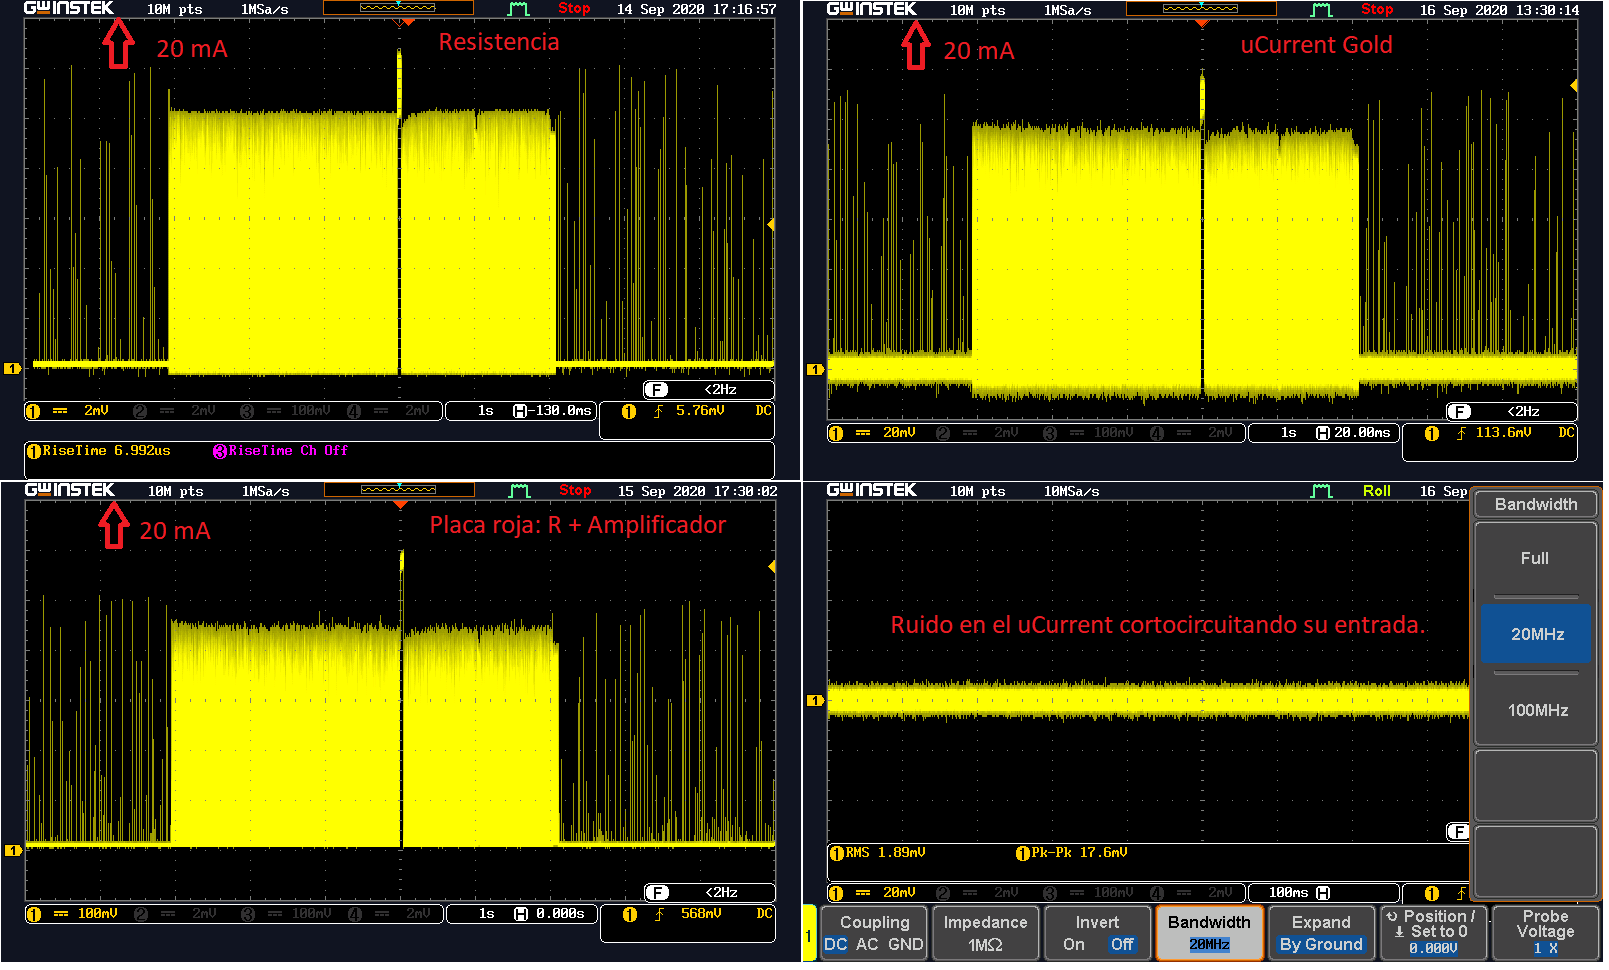 Captura con resistencia 0.1 Ohms, R + Amplificador, uCurrent Gold.